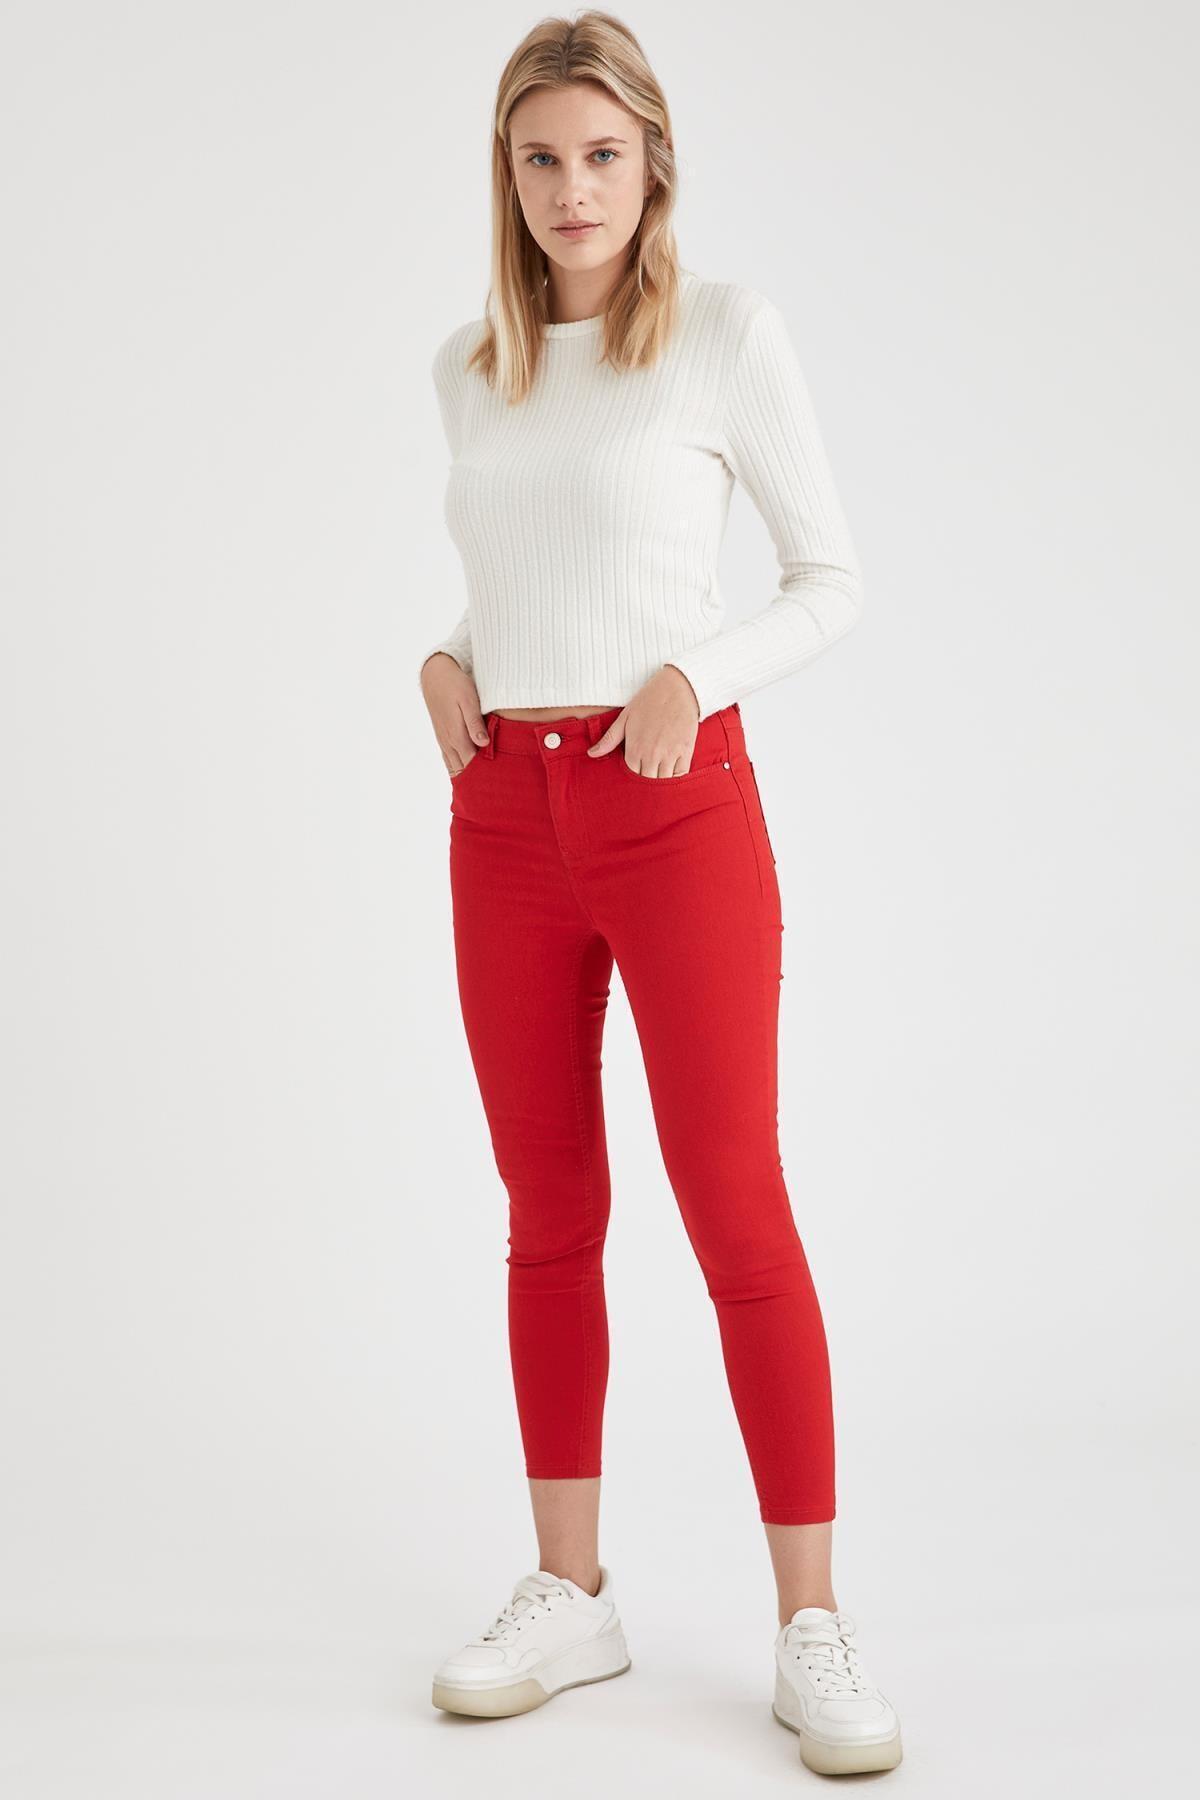 Kadın Kırmızı Dokuma Pantolon L5558AZ.19HS.RD51